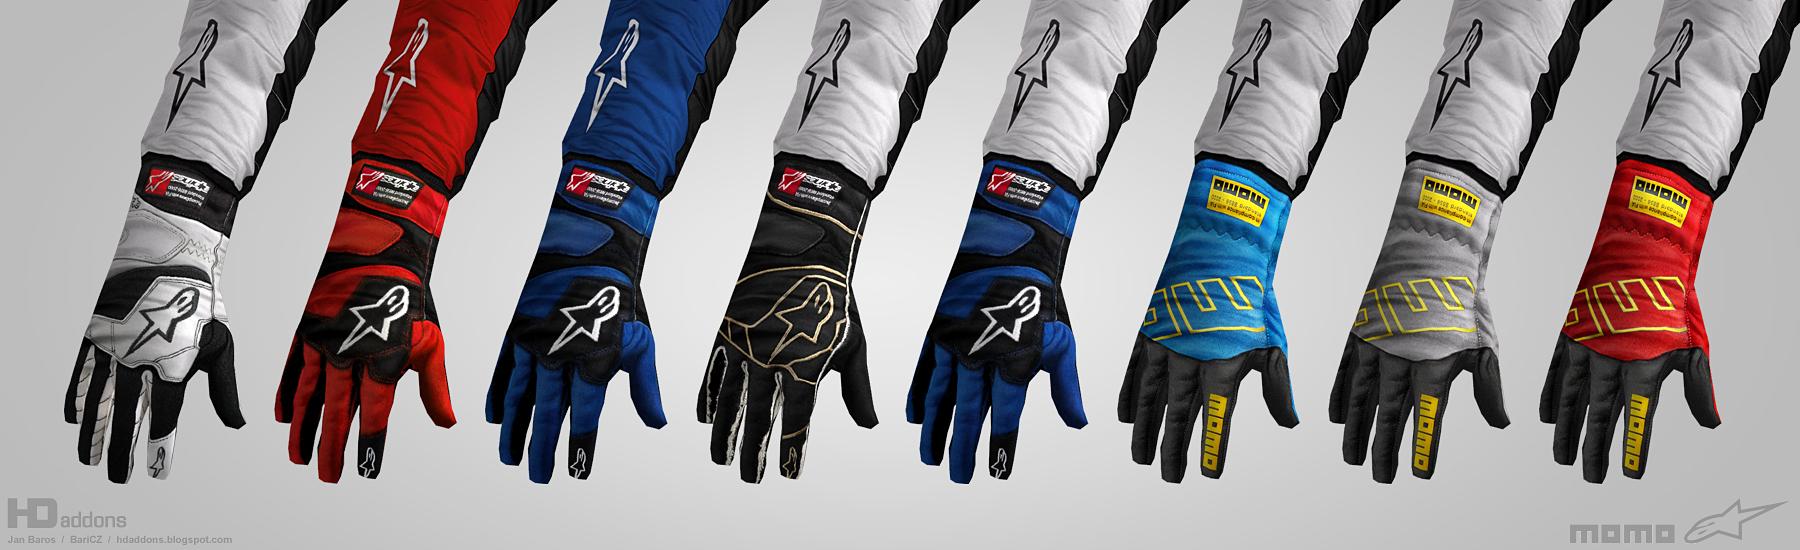 Driving gloves grip -  Racing Driving Gloves Gloves Alpinestars Race Gloves Motorsport Gloves